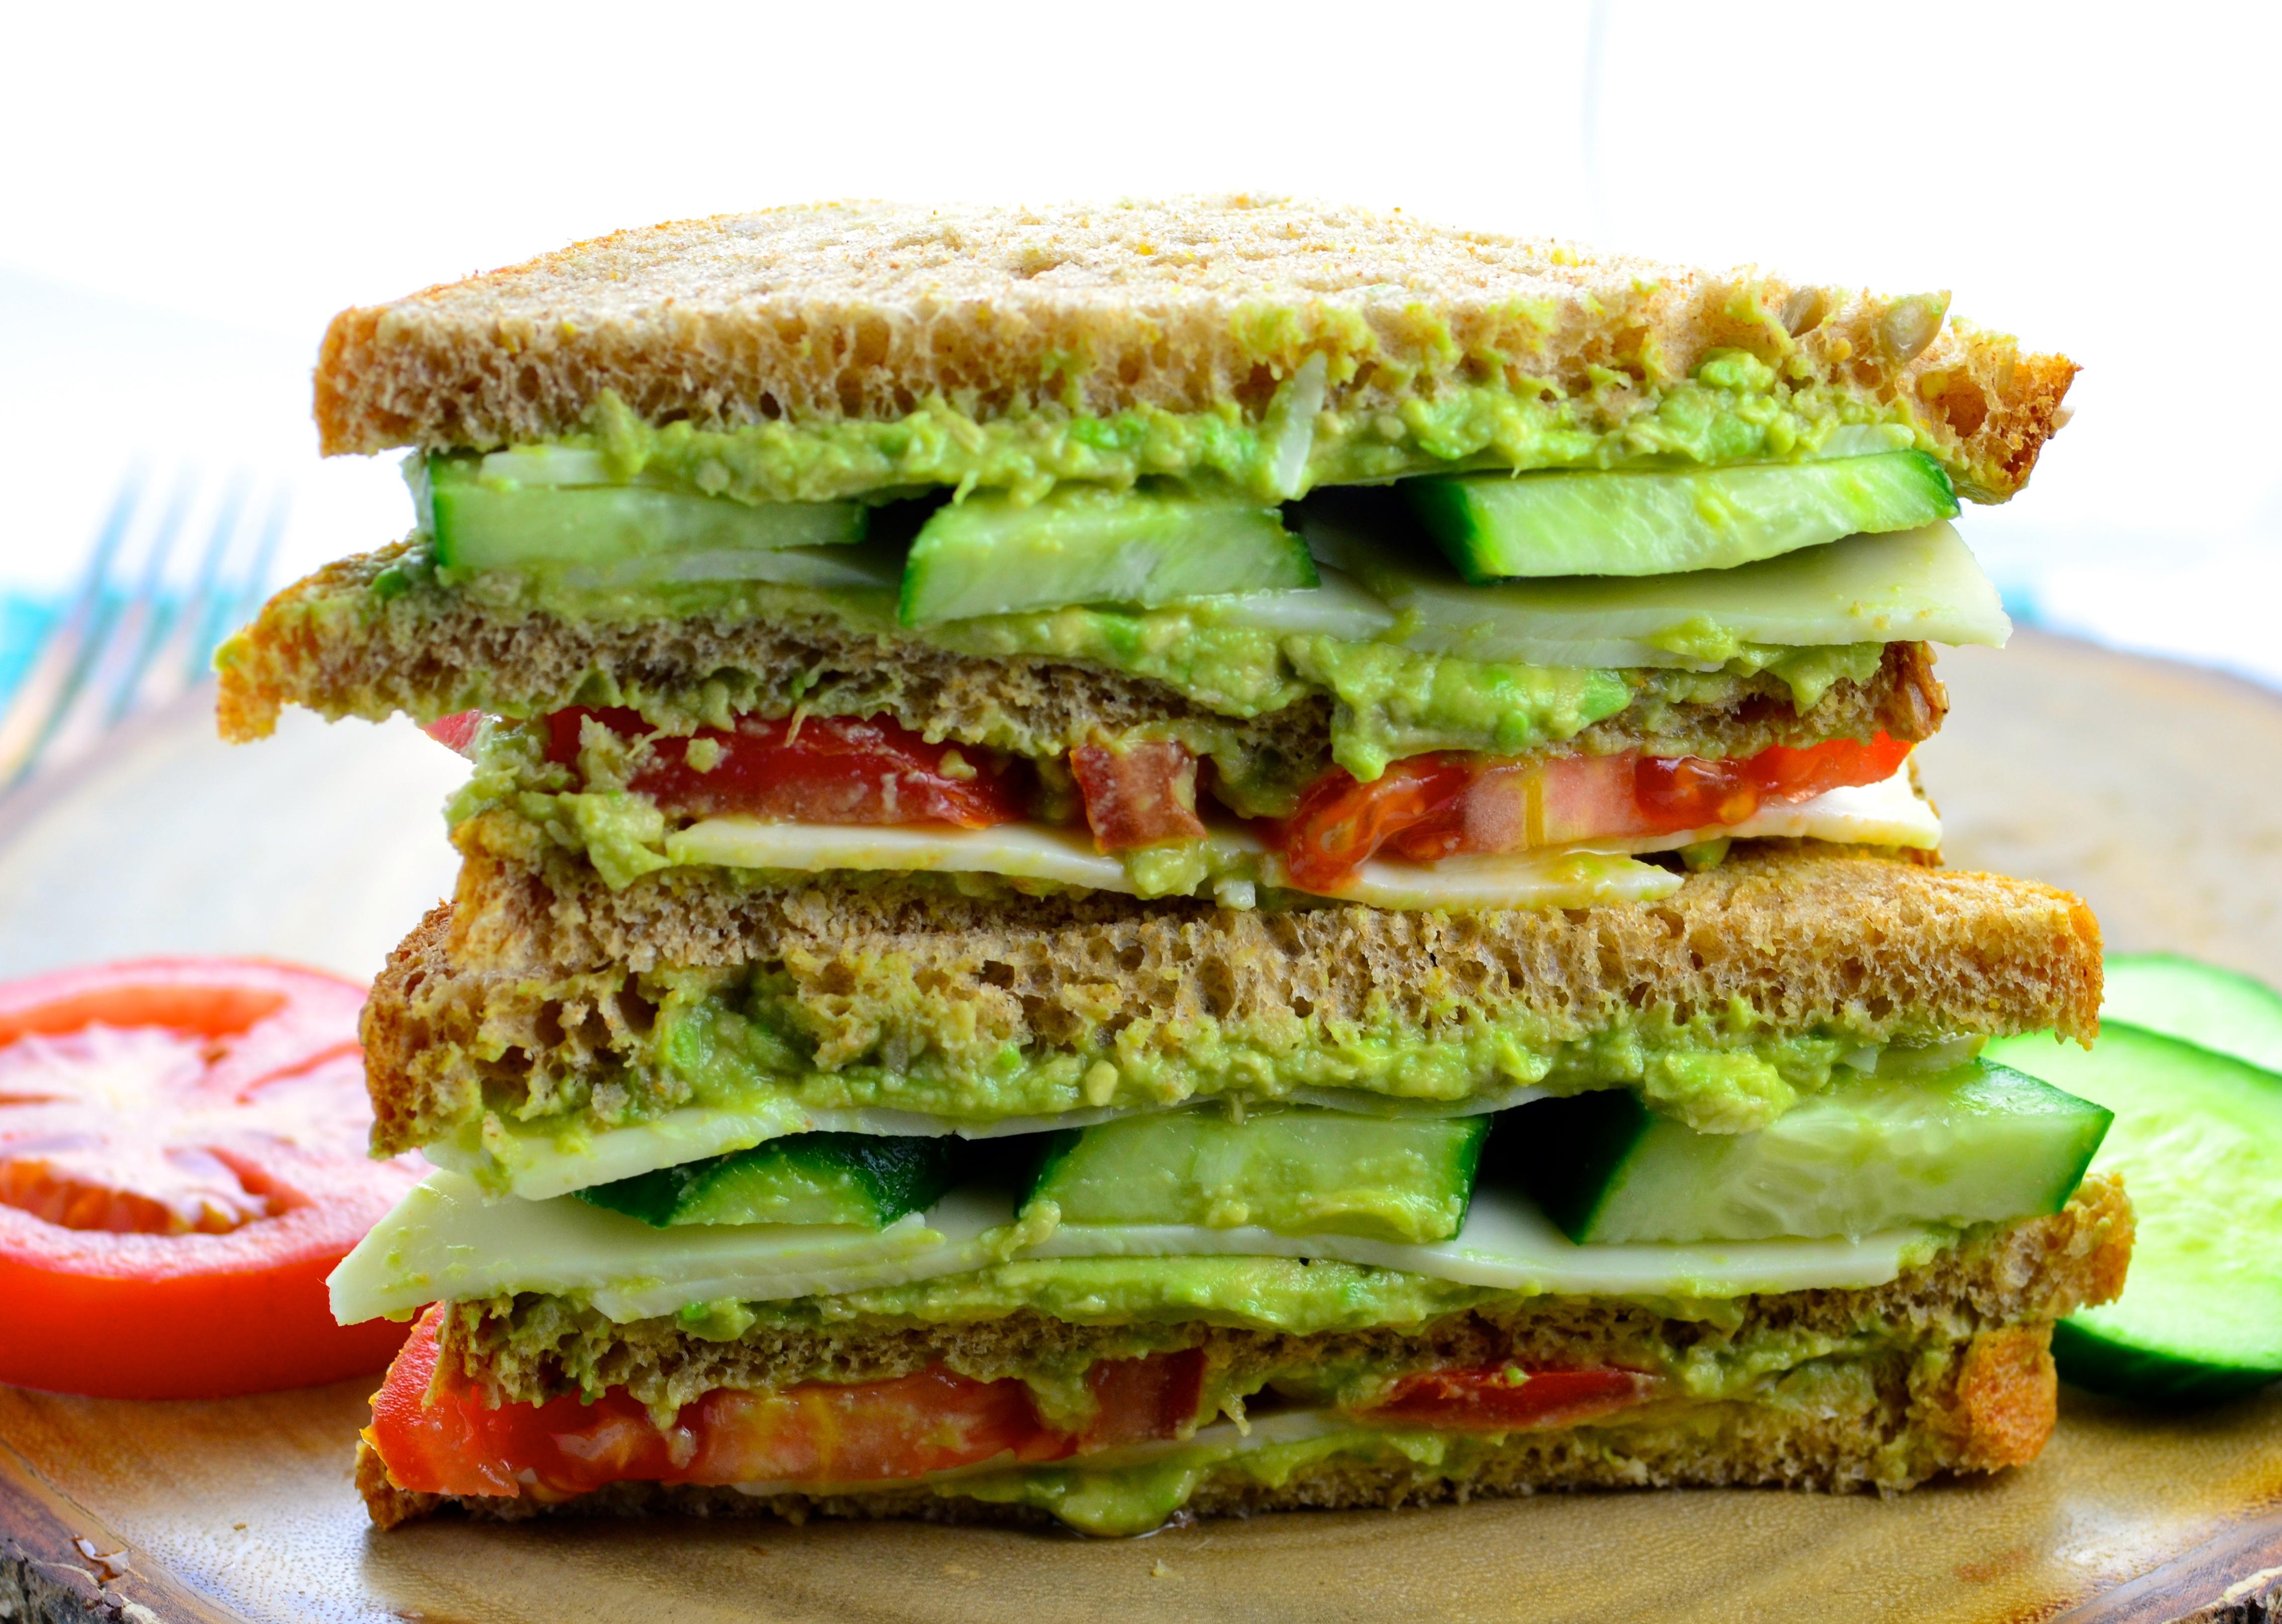 Triple Decker Wasabi Cheese & Avocado Sandwich